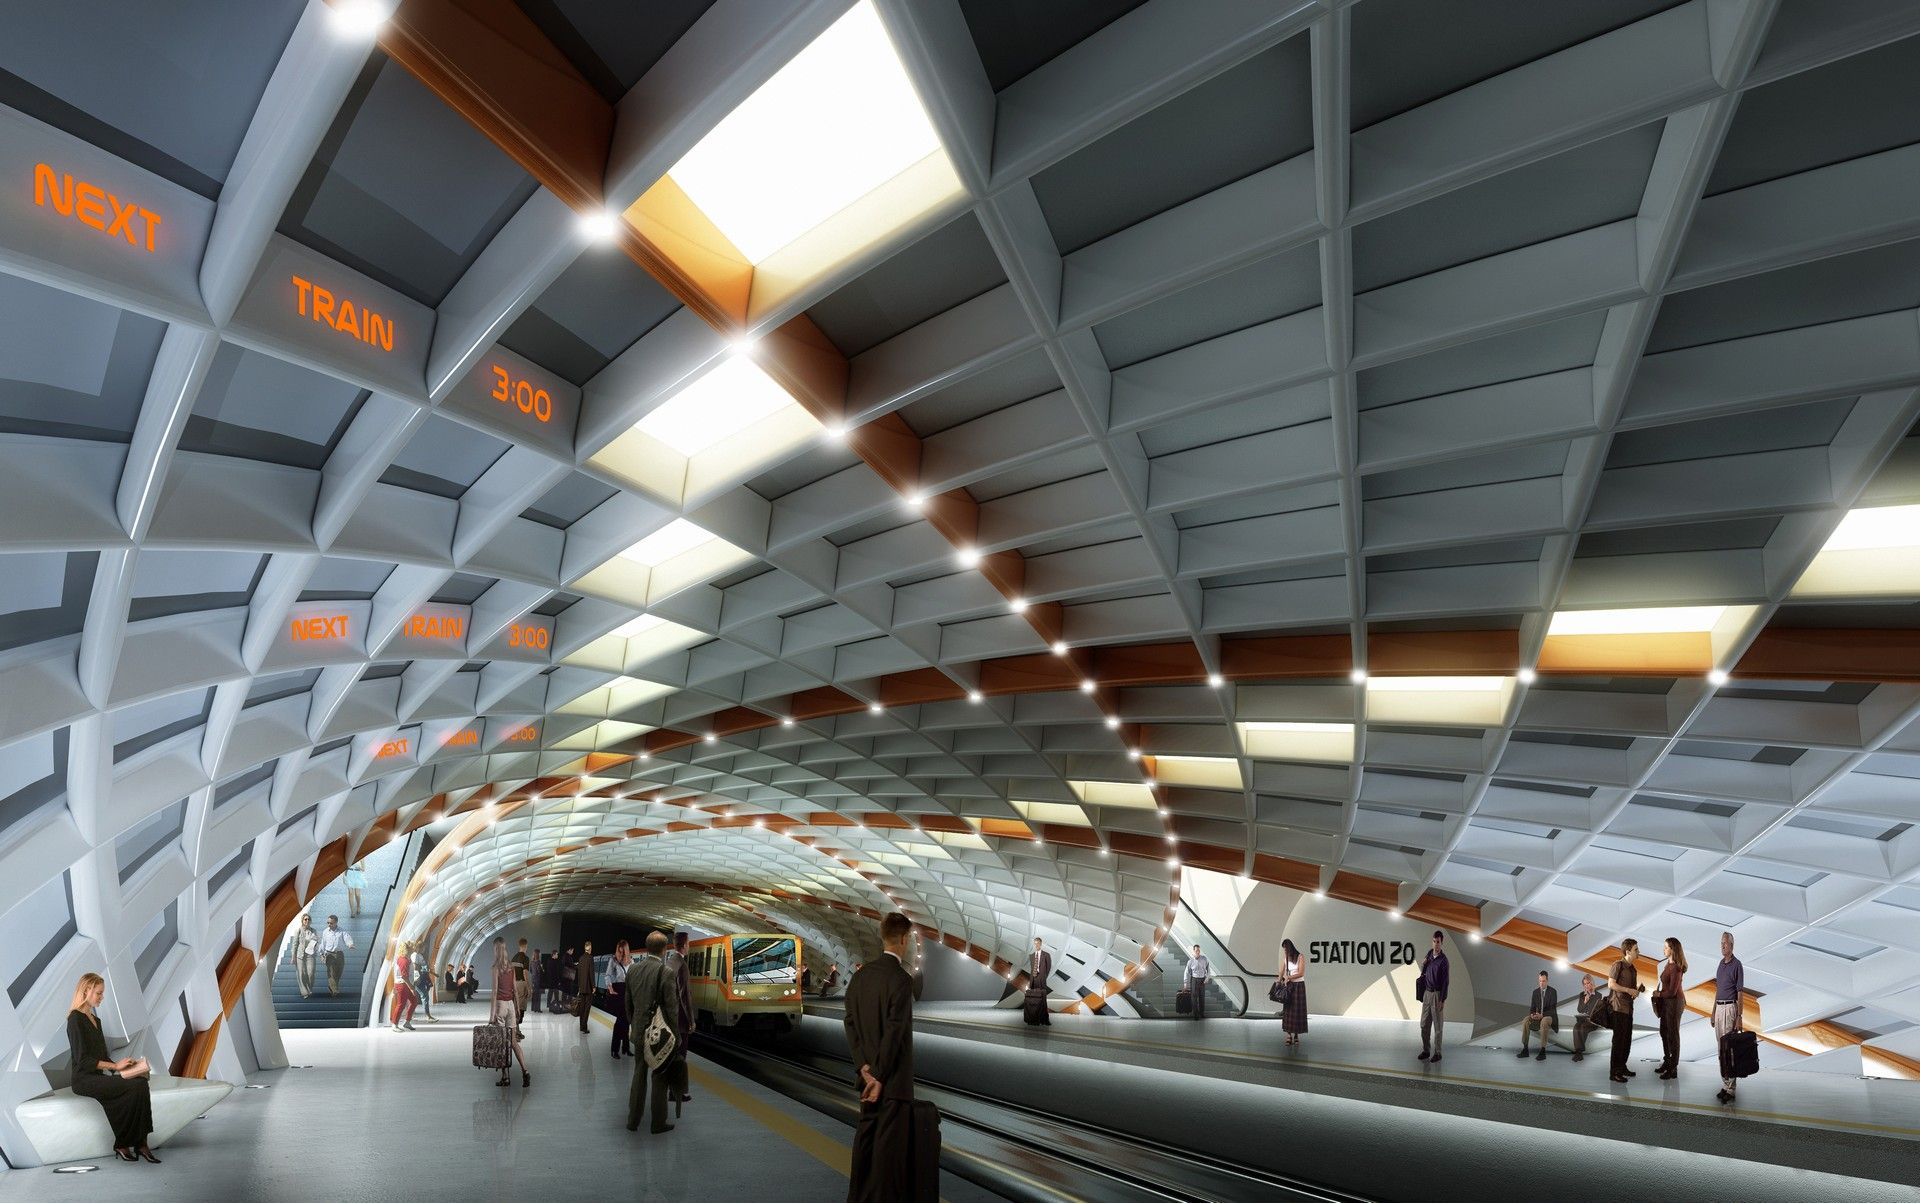 s20 Metro Station | Inspiring Ideas | Pinterest | Metro station and ...